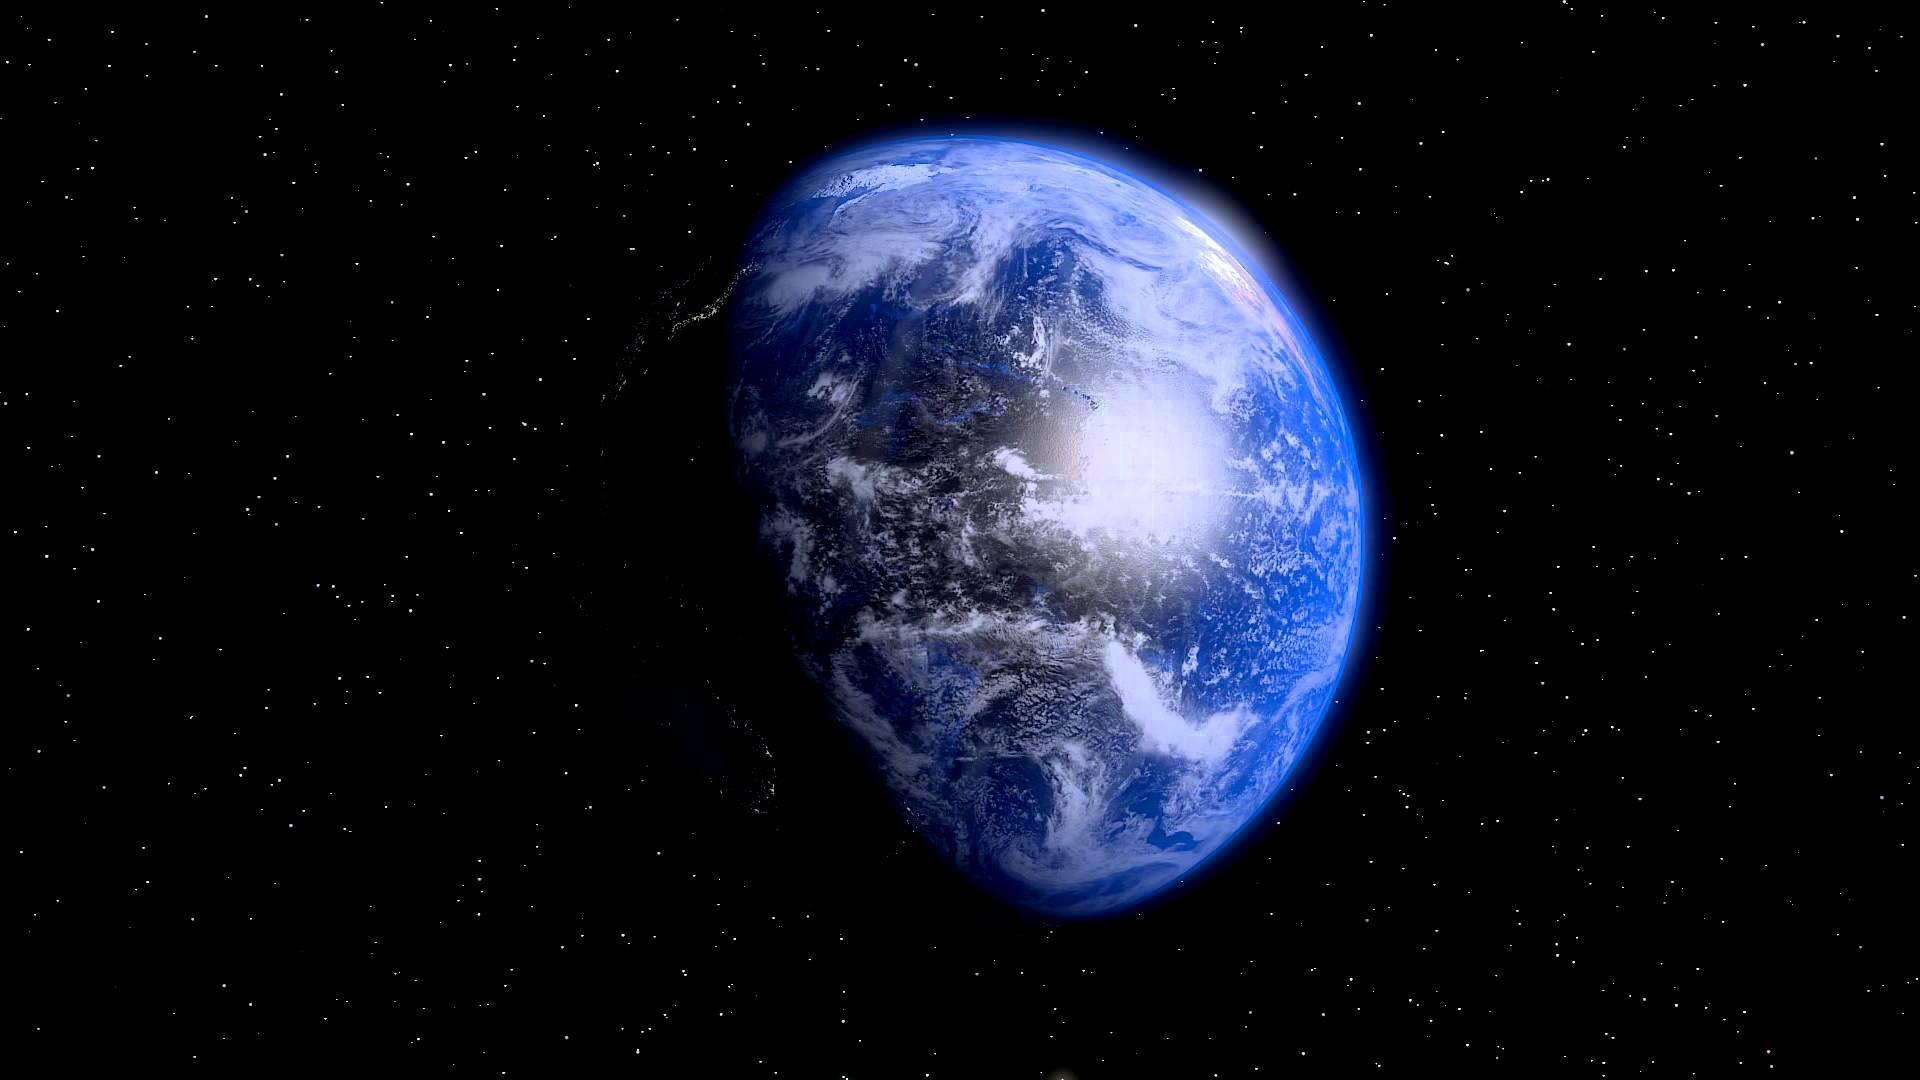 Wallpaper Blue Earth Stars Universe 1920x1080 Full Hd 2k Picture